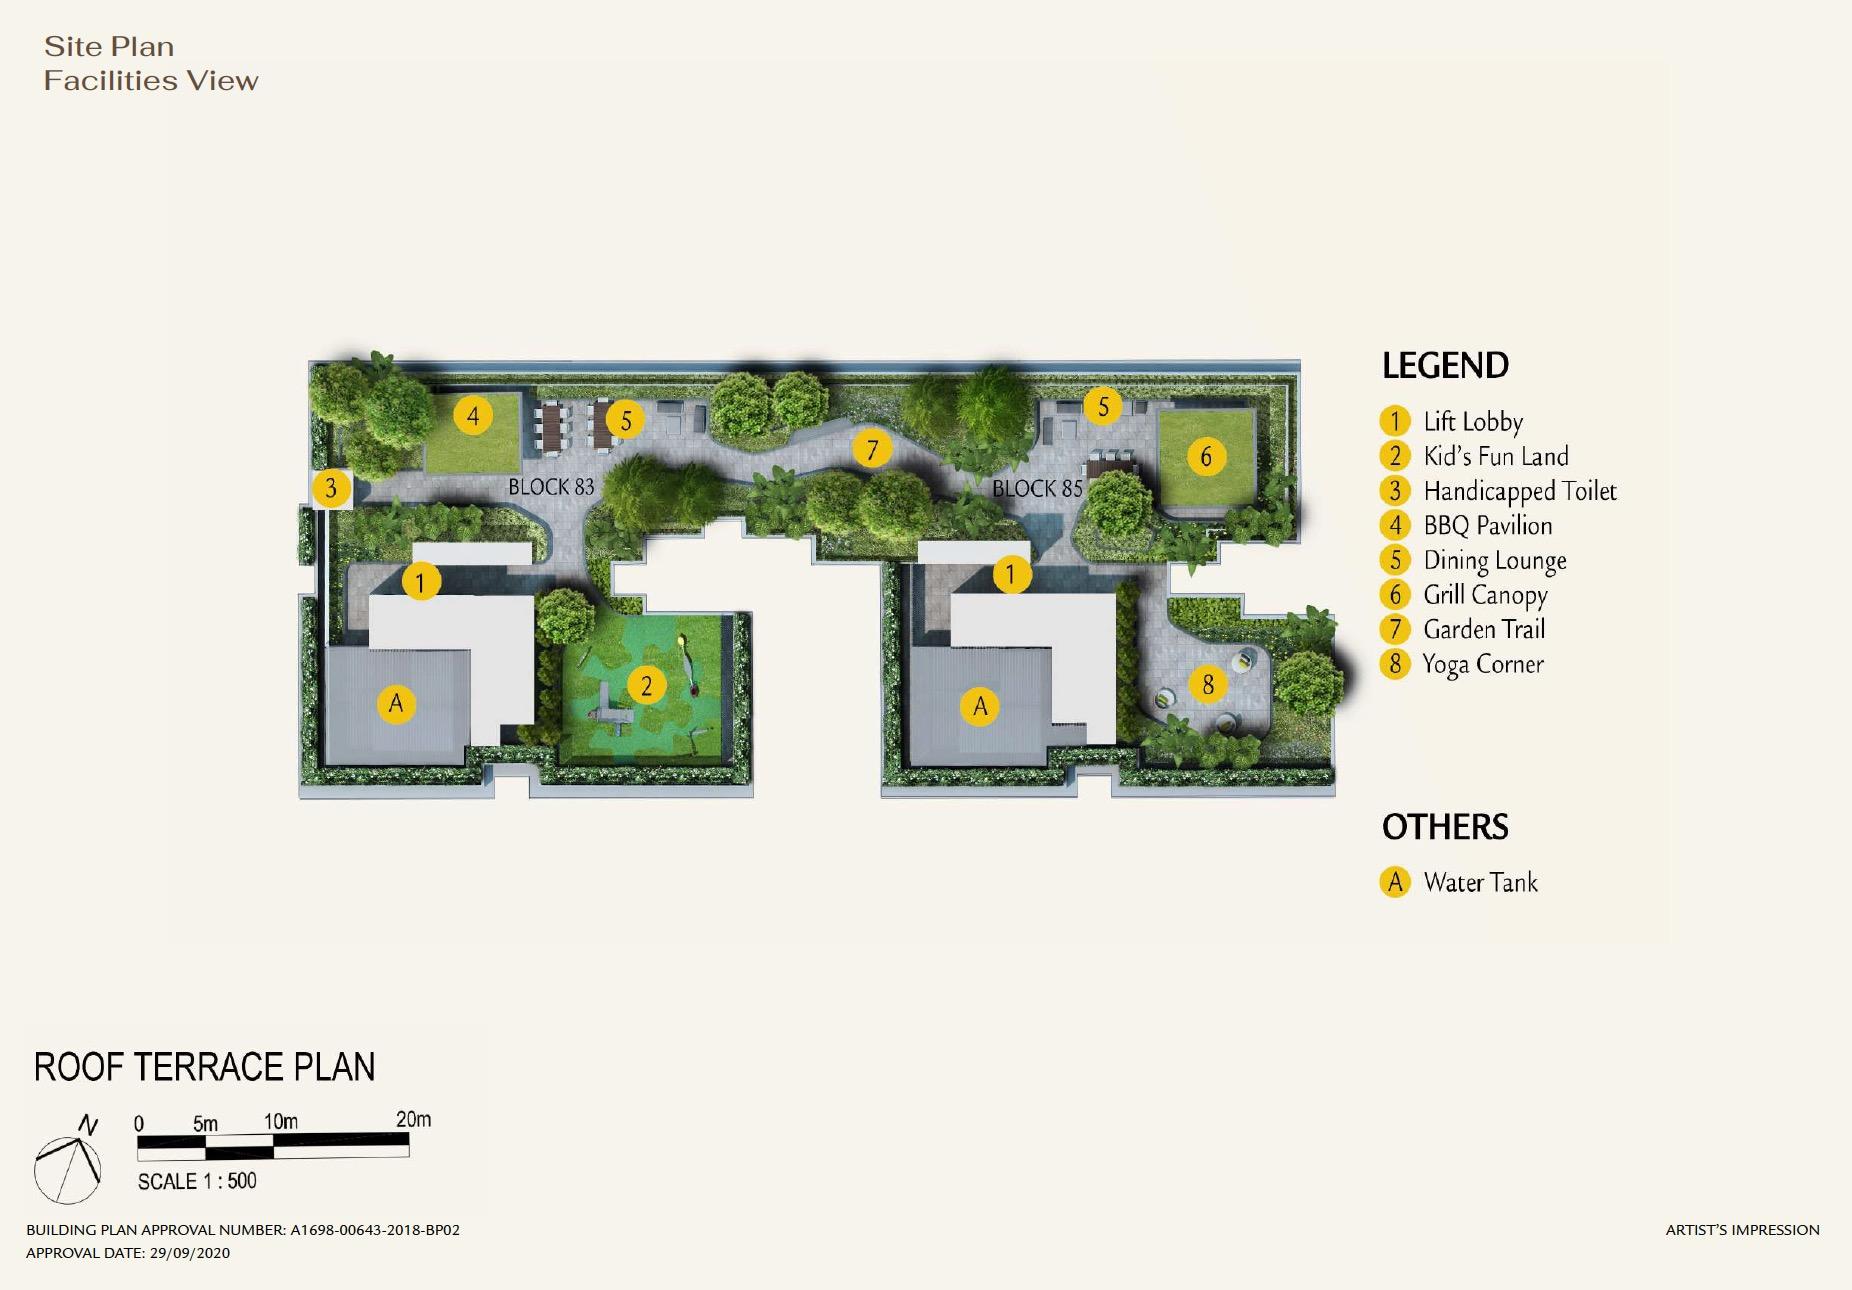 Phoenix Residences site plan facilities